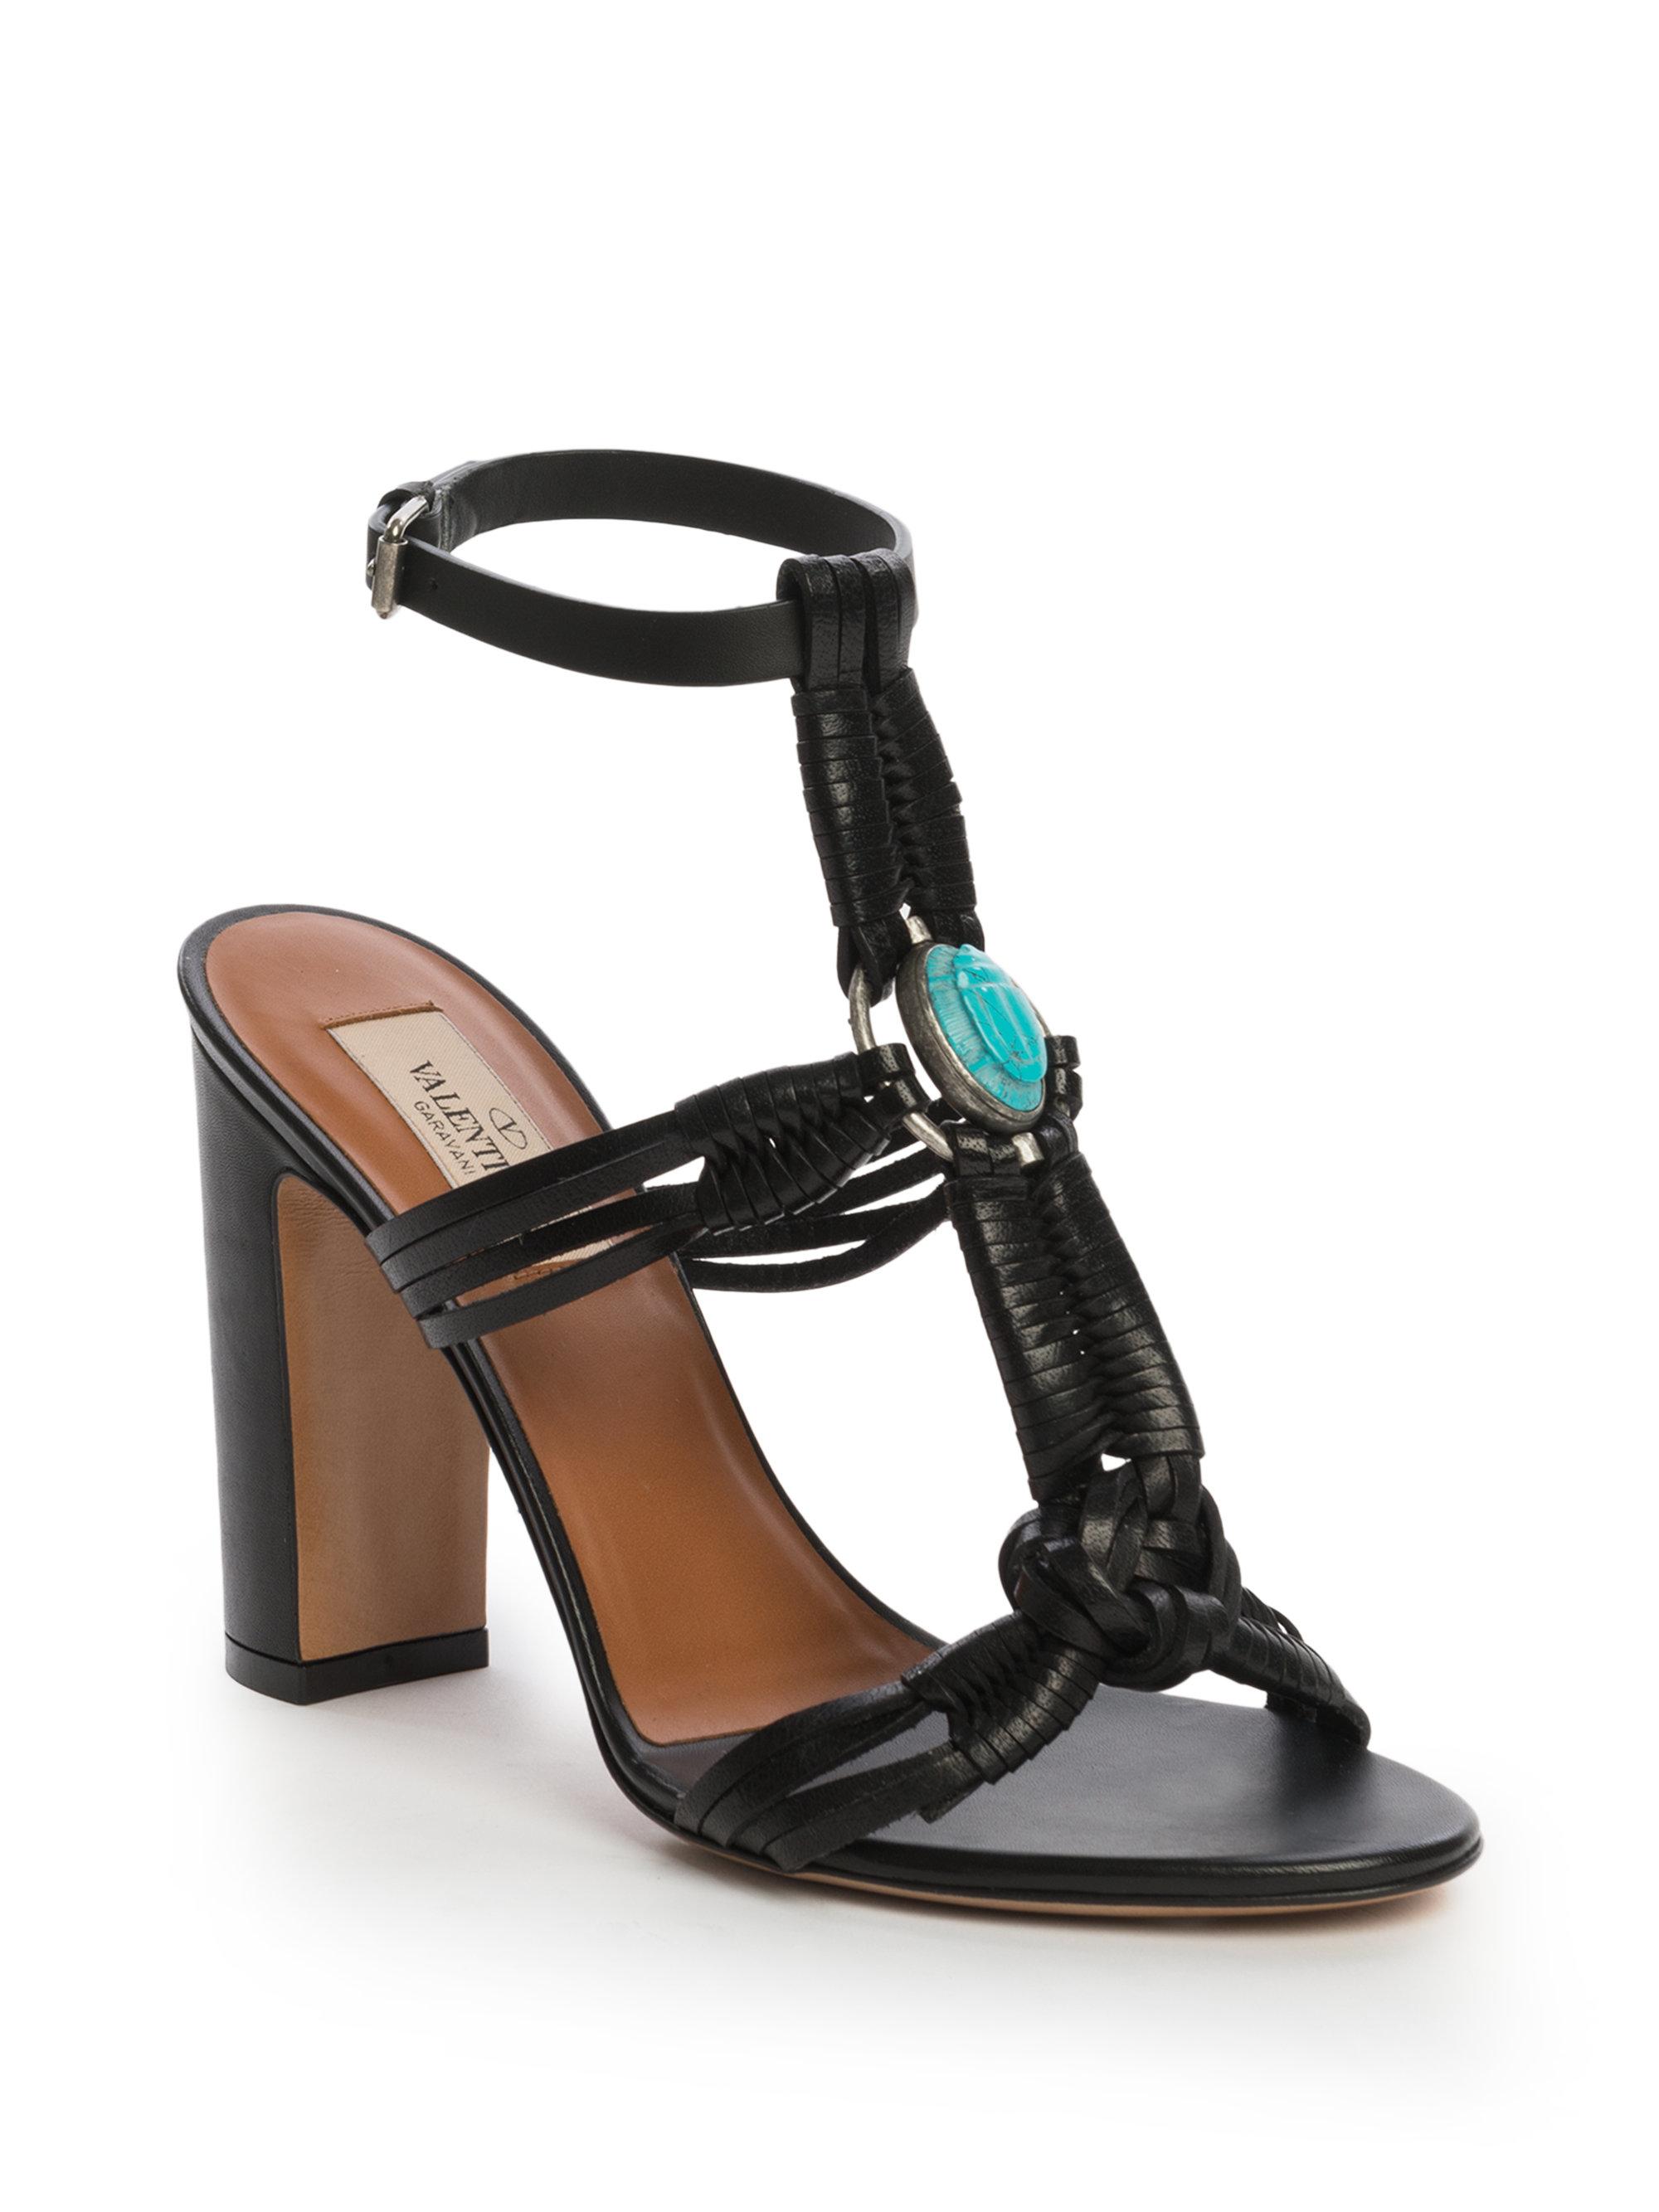 0c8f3bfc34c6 Lyst - Valentino Braided Leather Scarab Sandals in Black